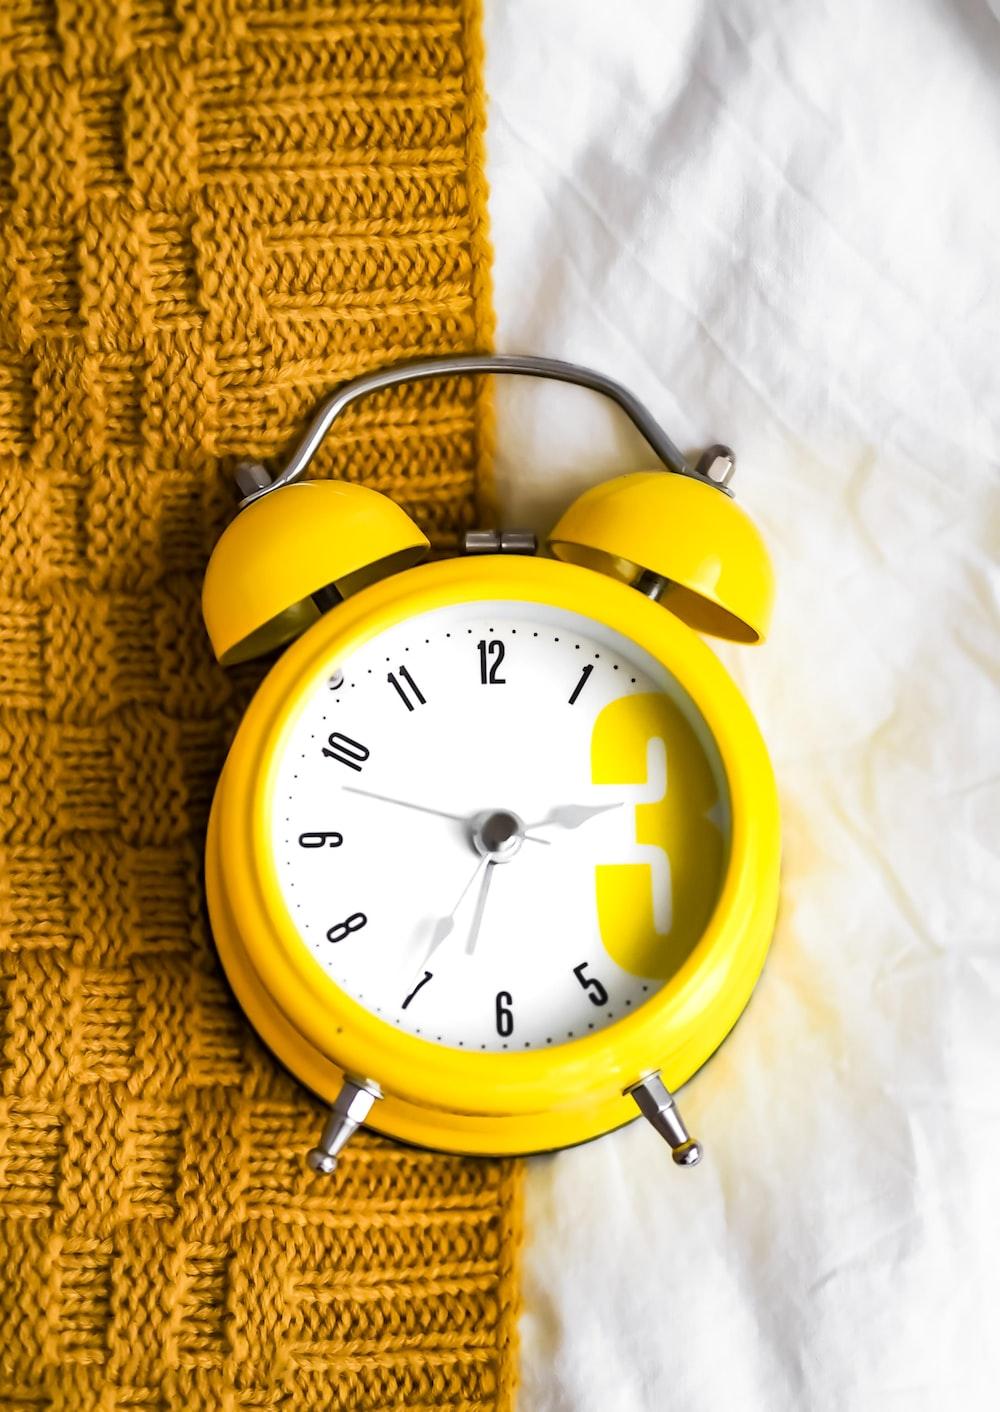 yellow and white alarm clock at 10 10